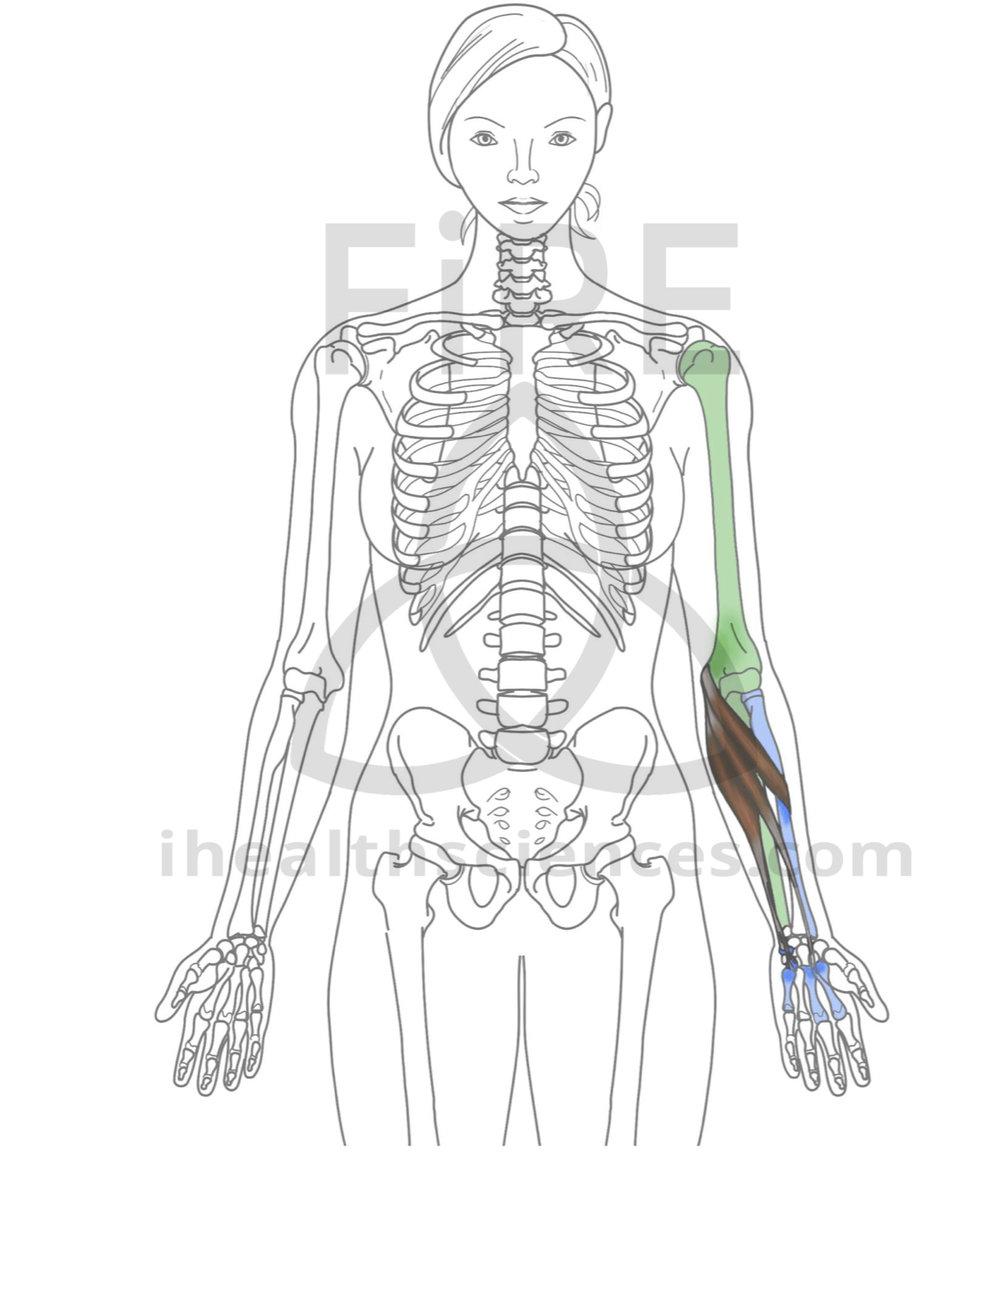 forearm flexor group (pronator teres, flexor carpi radialis, flexor carpi ulnaris).jpg